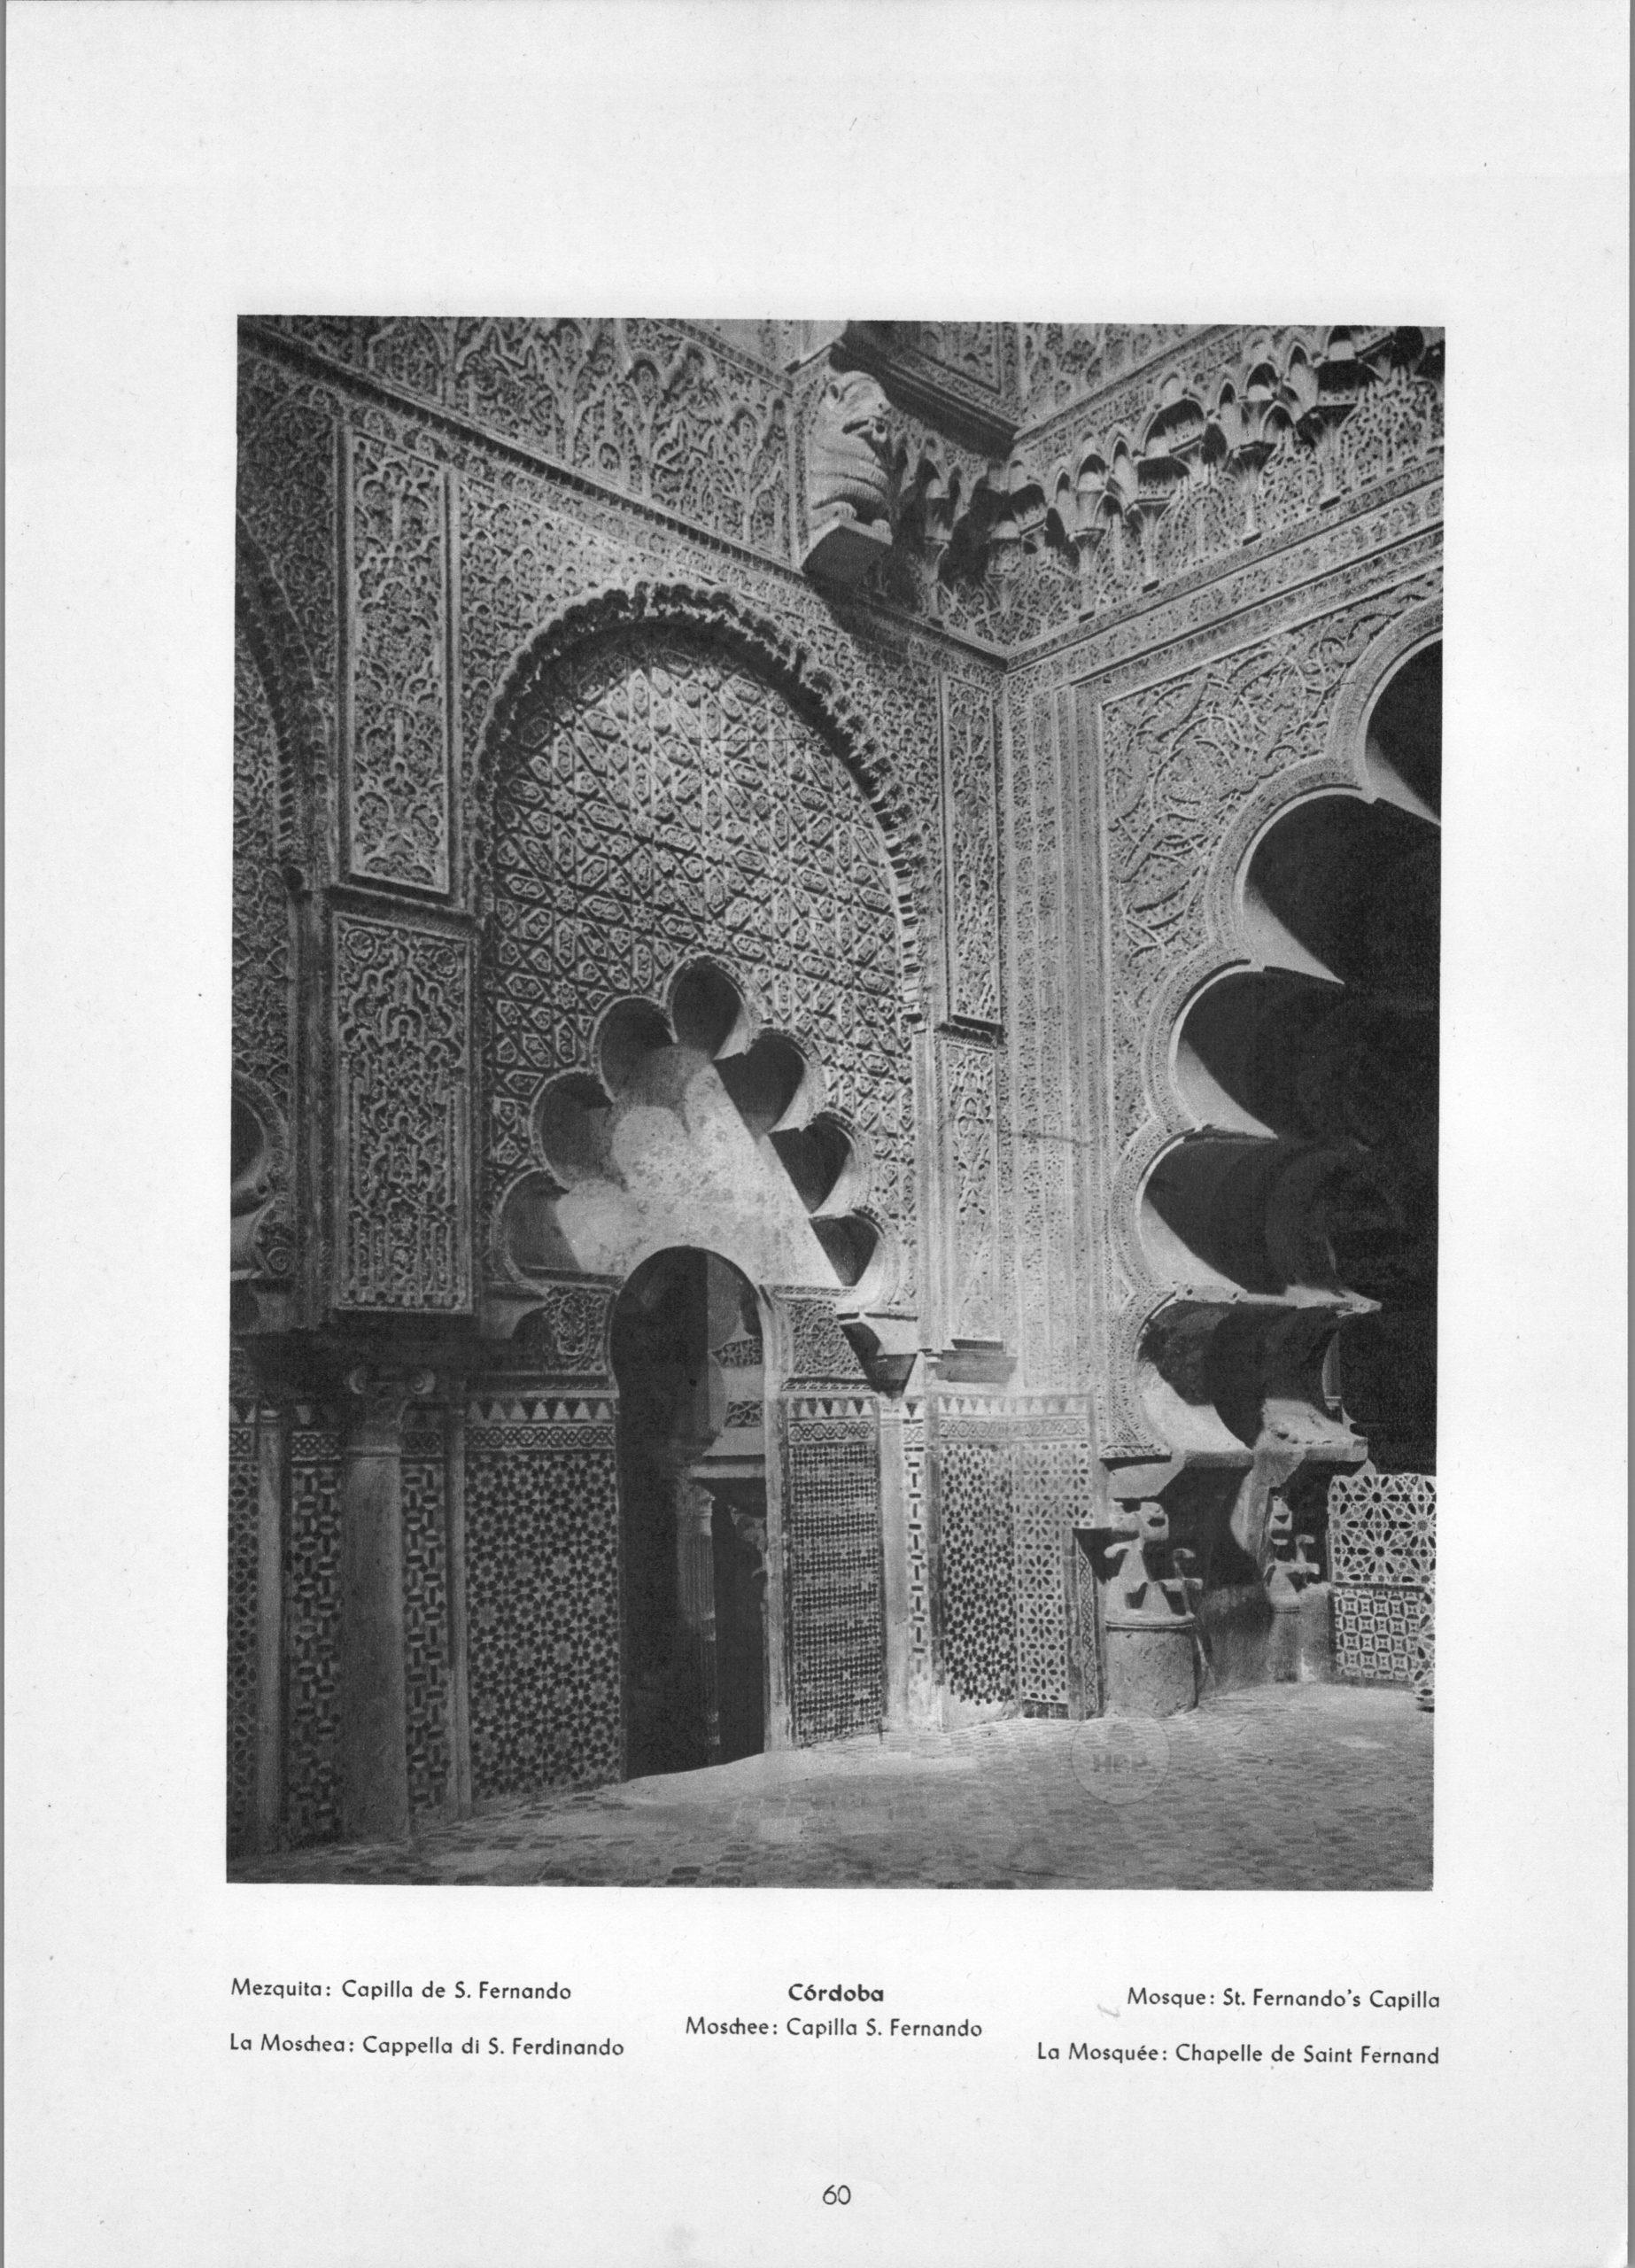 Córdoba Mosque - Mosque: St. Fernando's Capilla